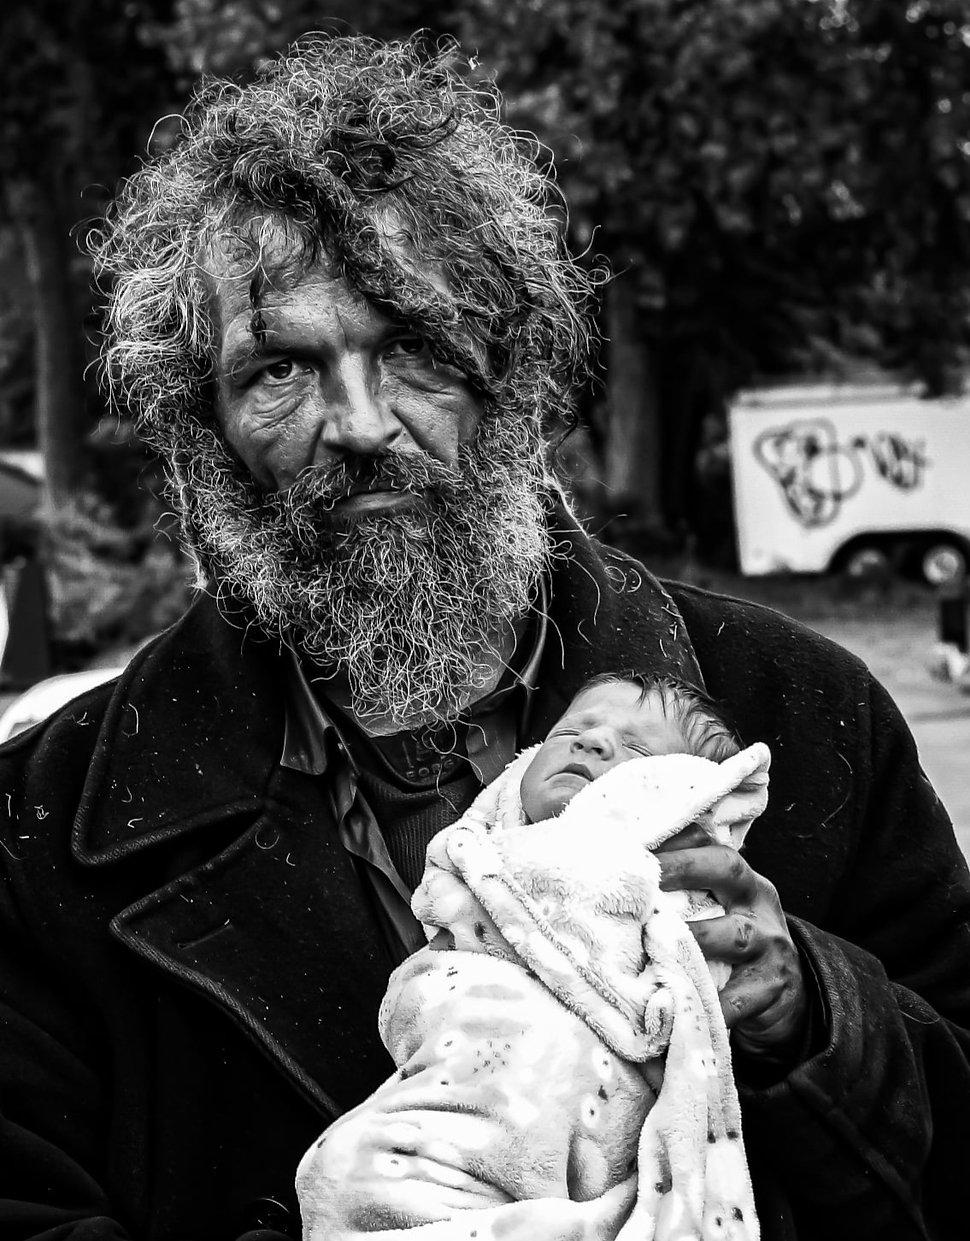 Photograph of a homless man holding a newborn baby